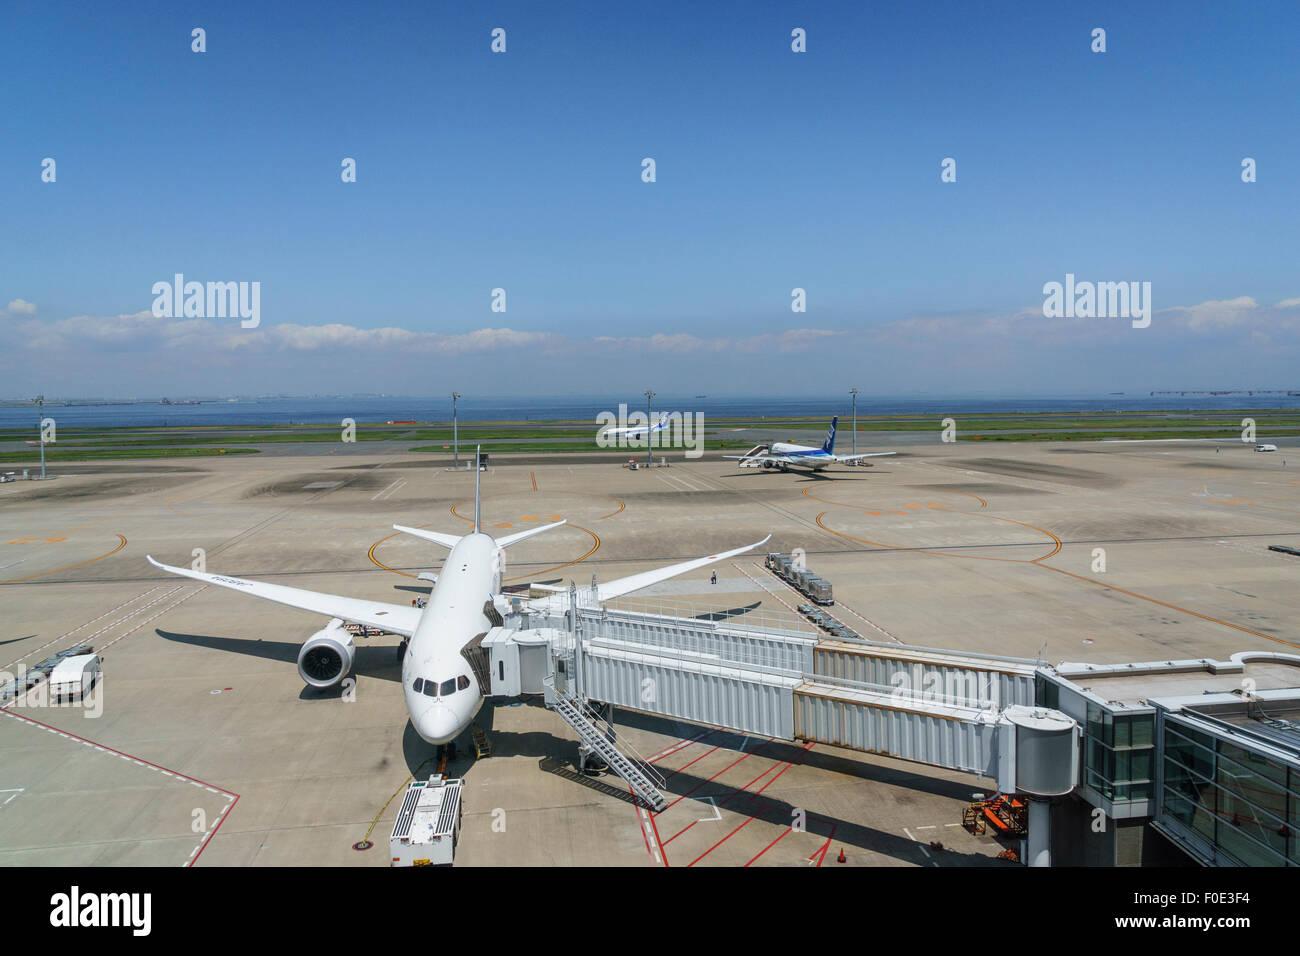 Airplanes at Haneda Airport in Japan - Stock Image